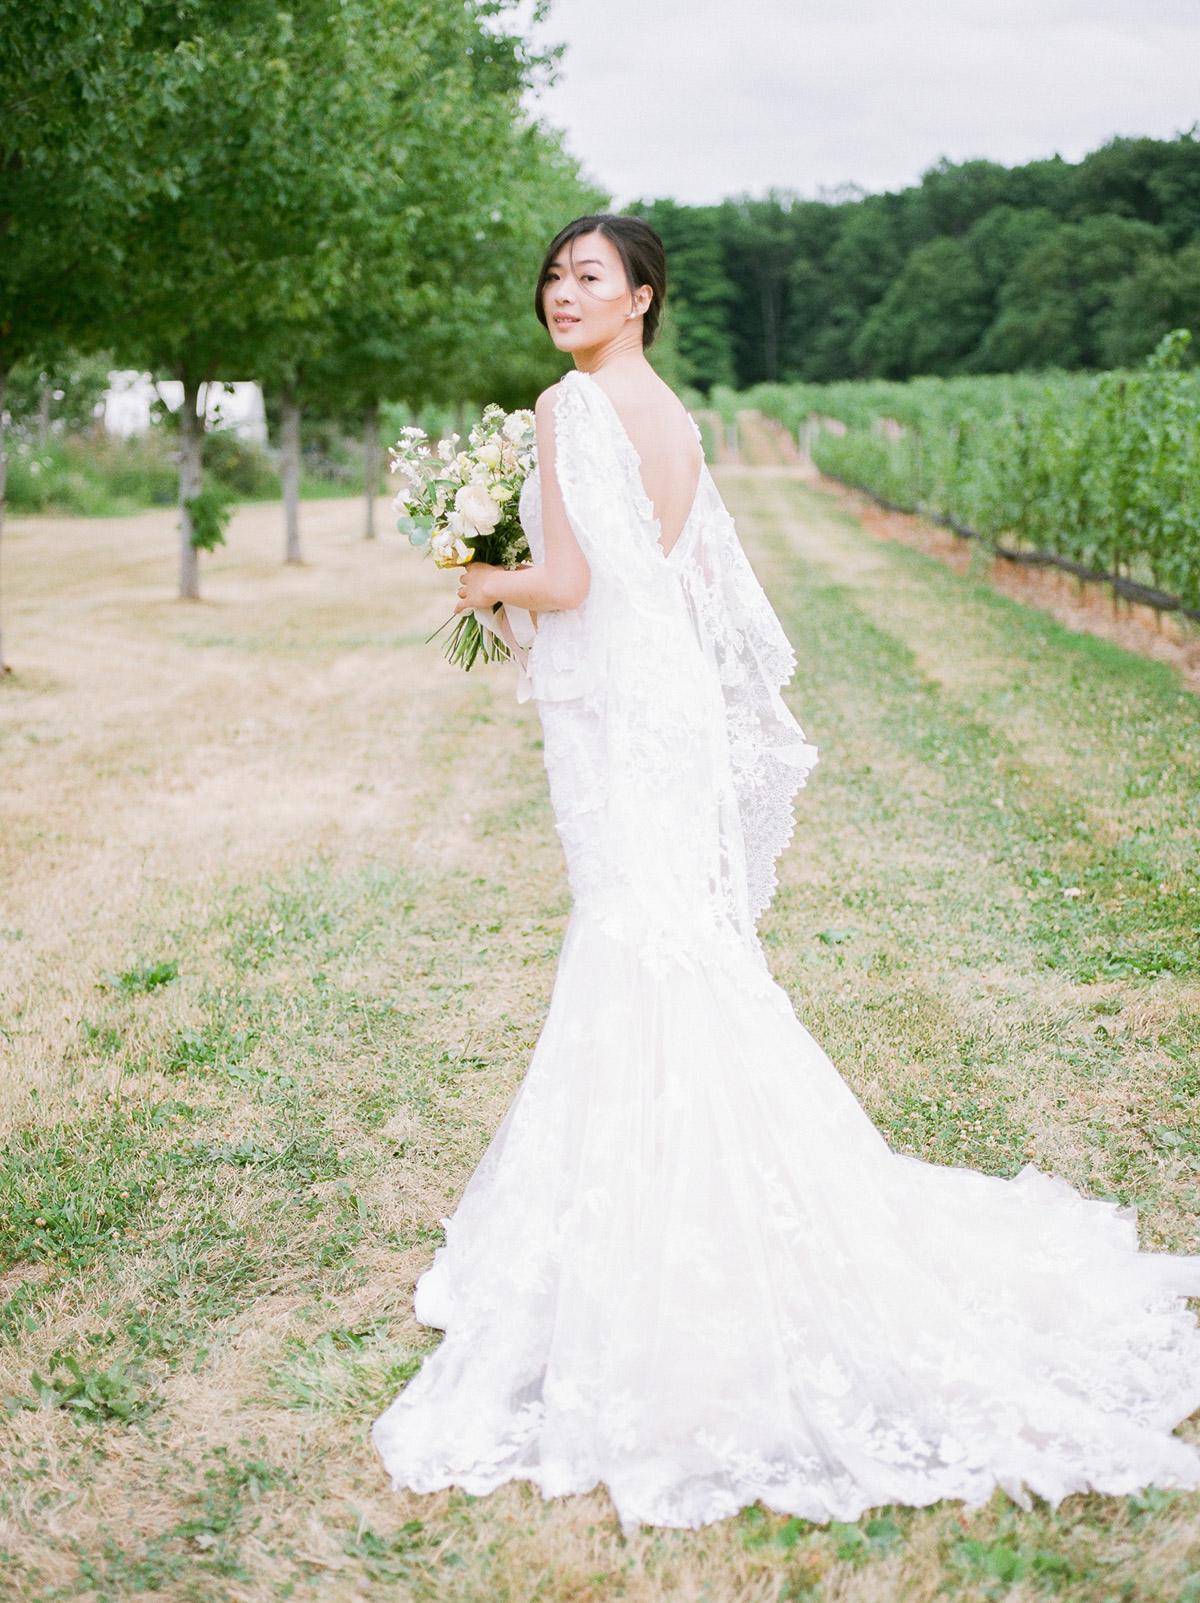 jennifer-xu-photography-vineyard-bride-swish-list-rosewod-eatstes-winery-beamsville-wedding-editorial-9.jpg